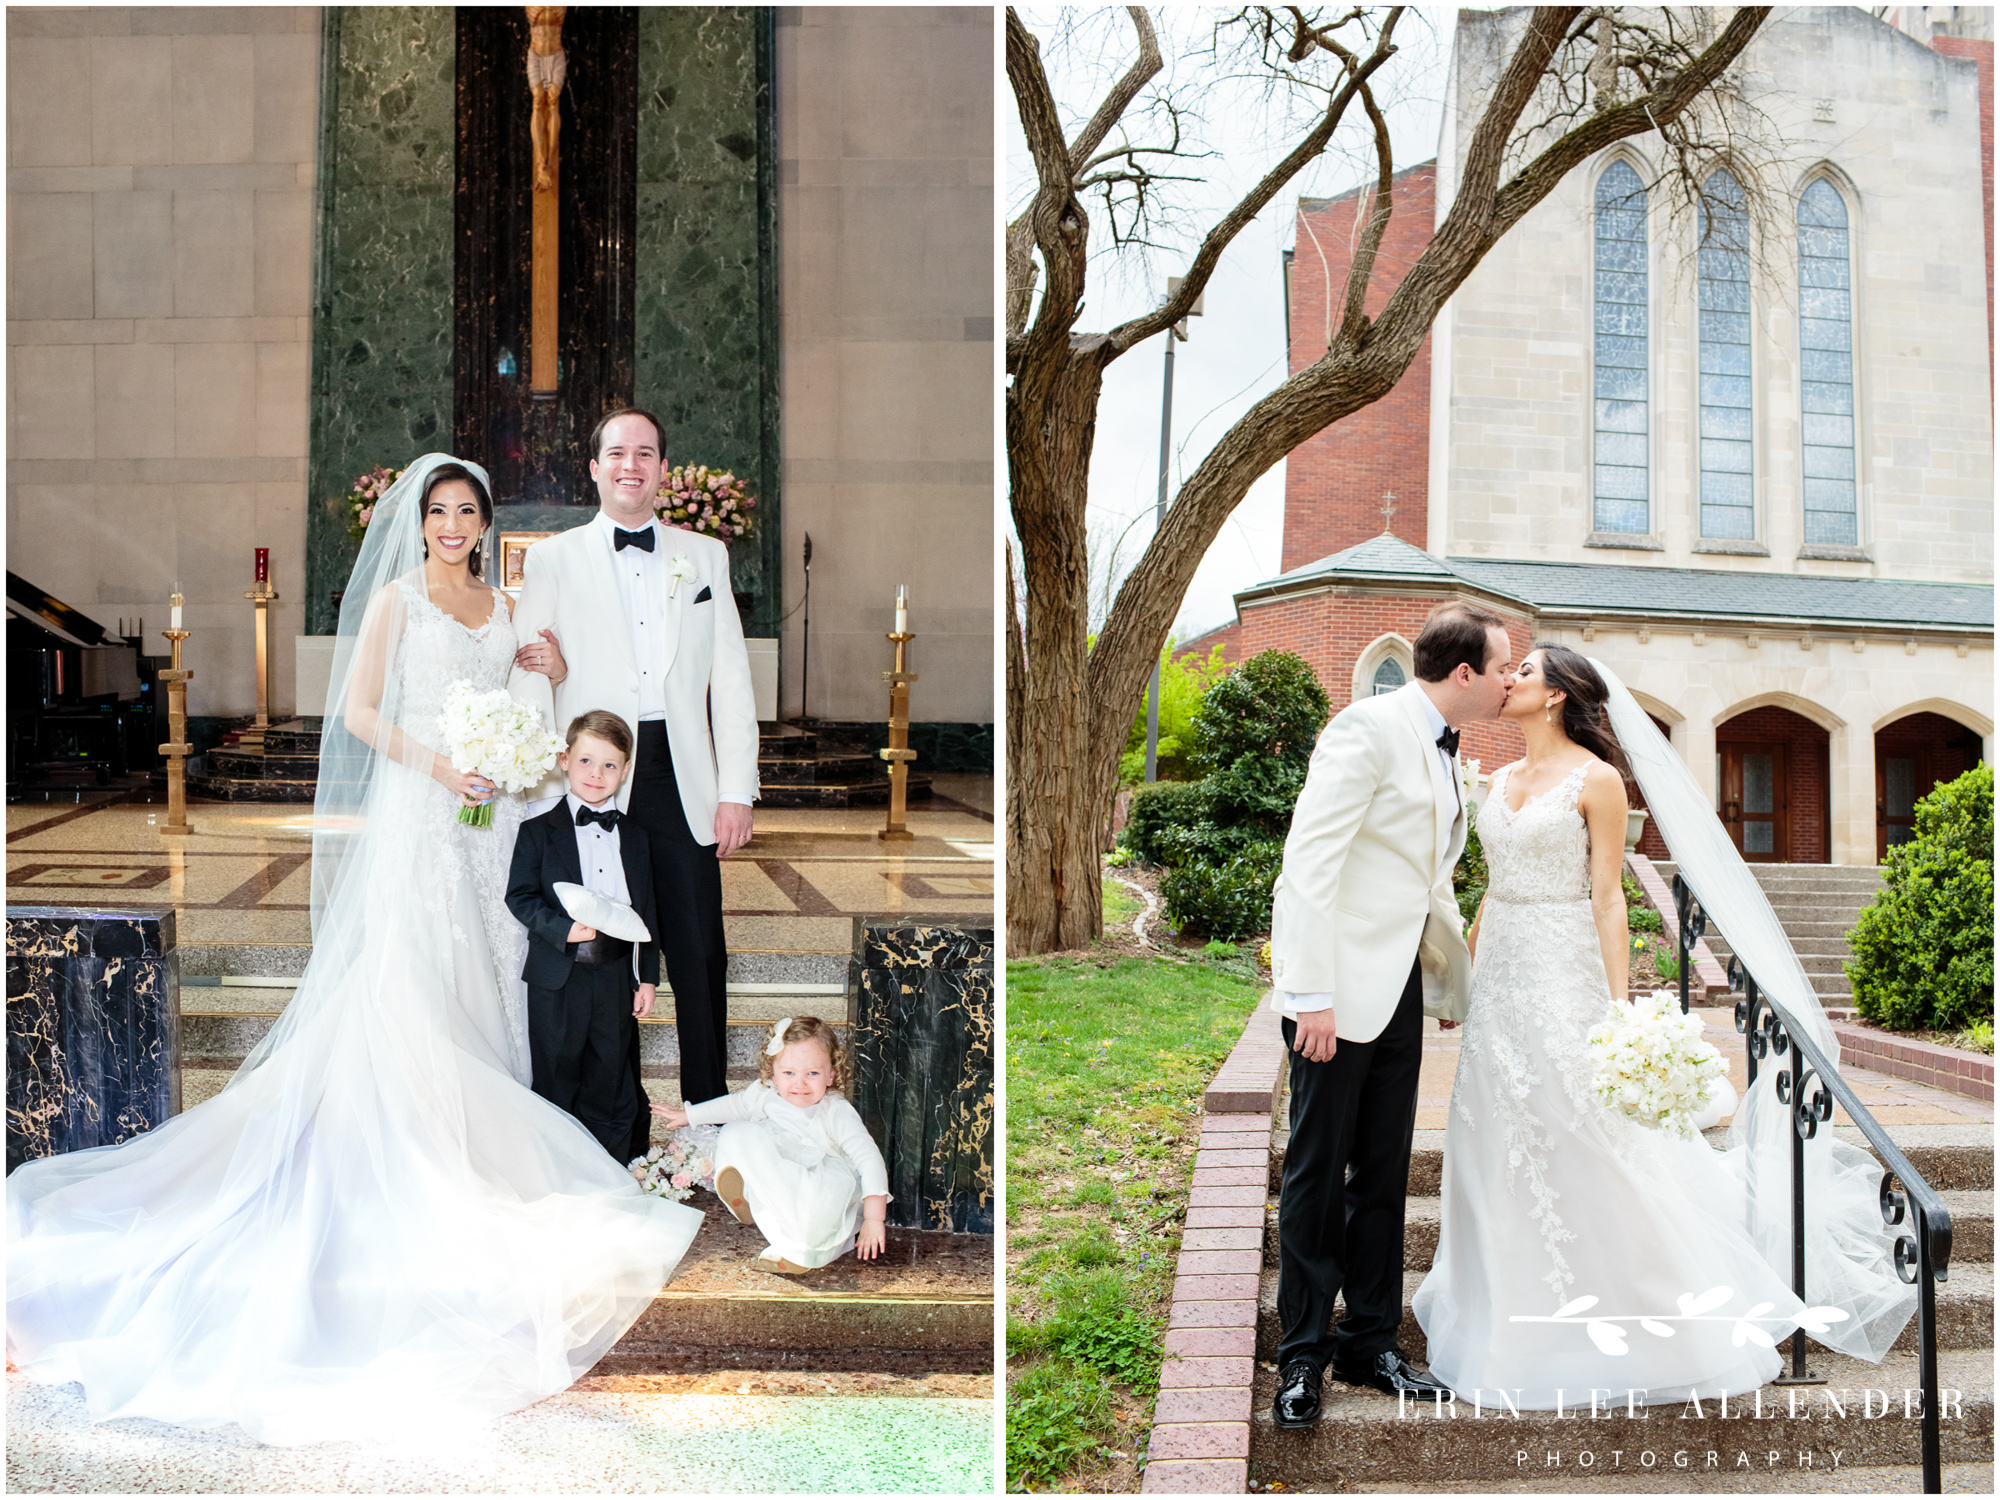 Christ-the-king-wedding-photographs